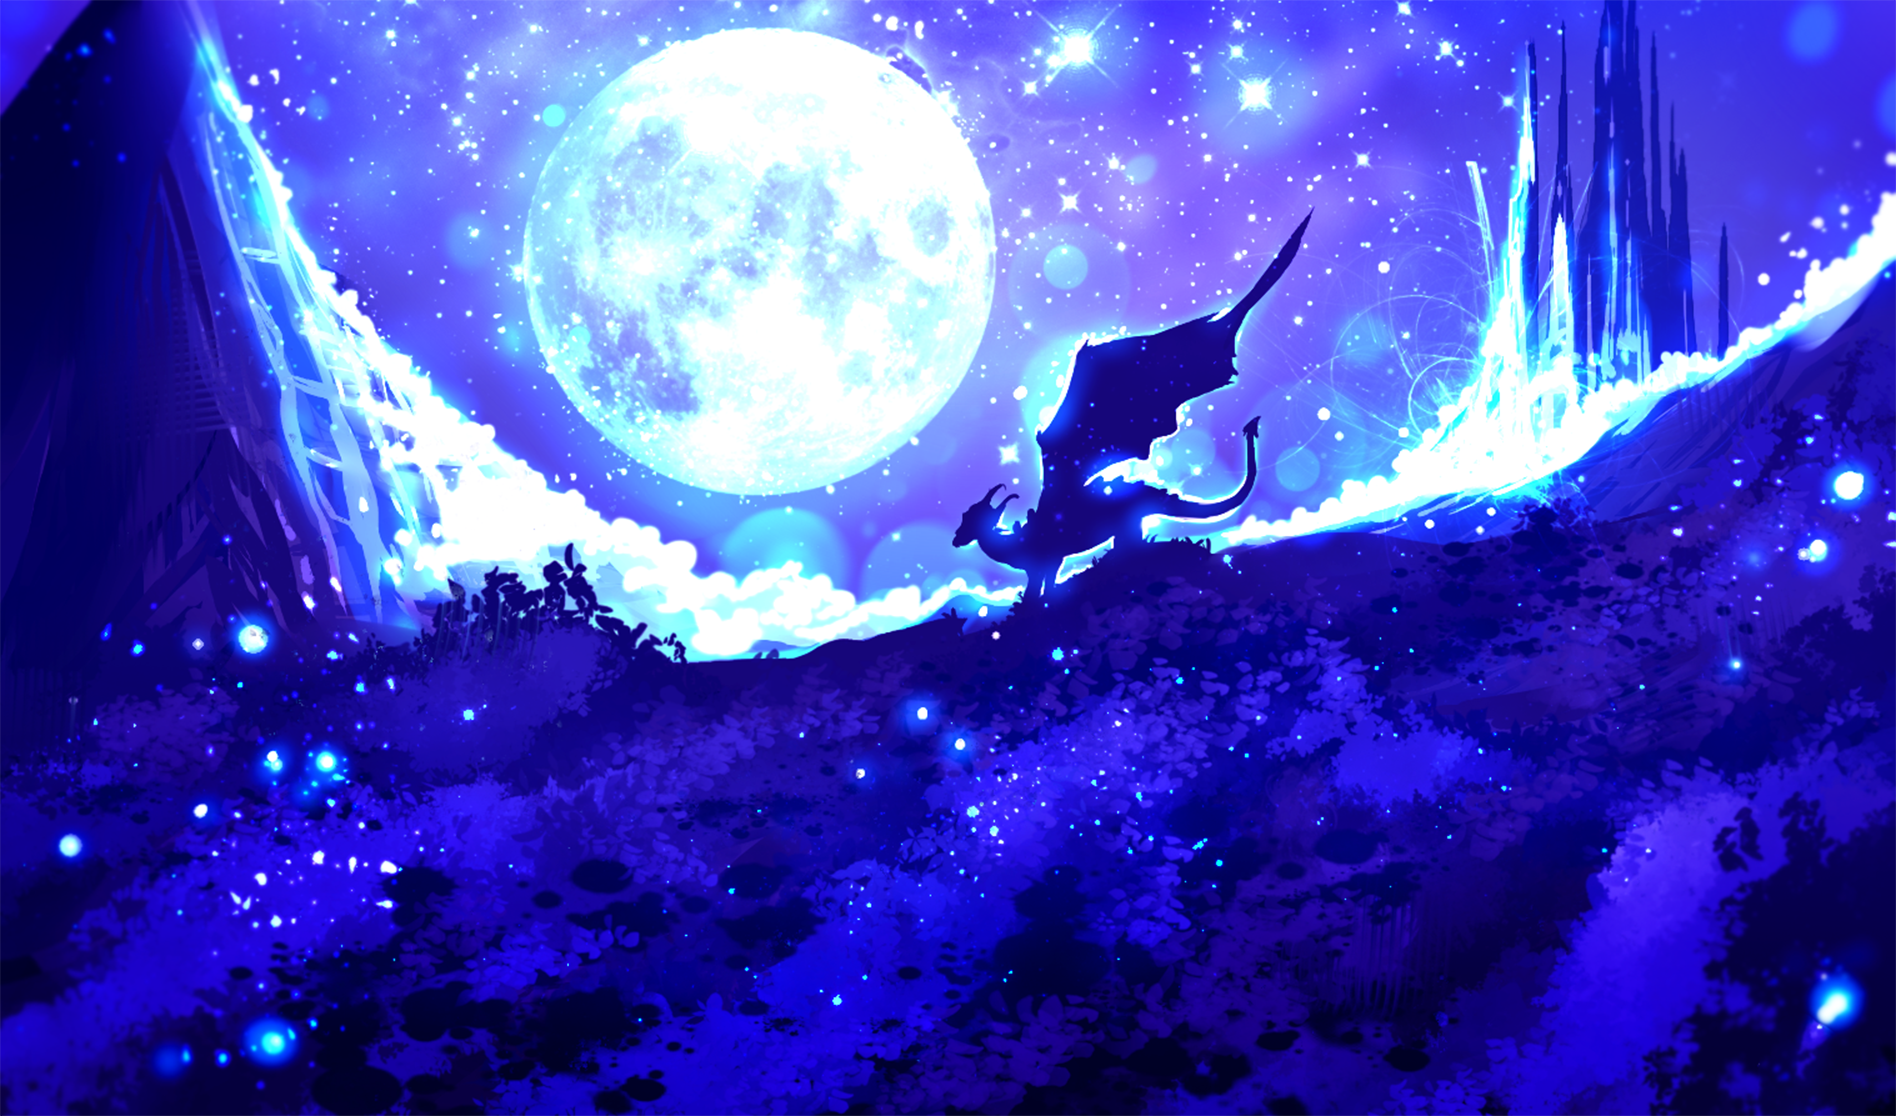 Blue Castle Dragon Fantasy Light Moon Night Sky Wings 1896x1116